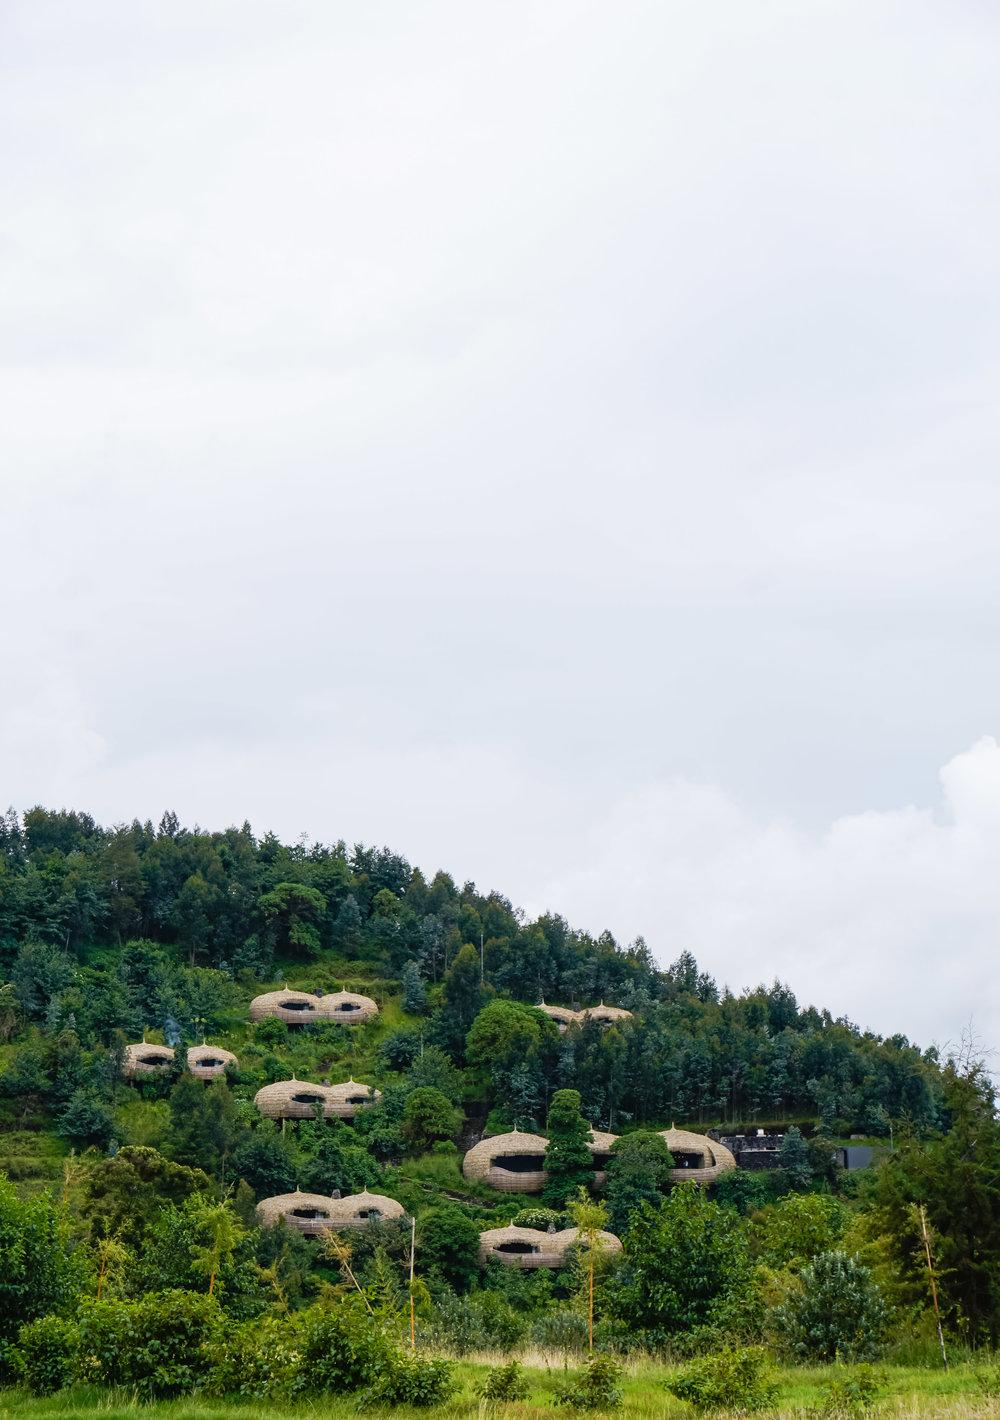 curio.trips.rwanda.bisate.lodge.drive.ip.view.IG.story.jpg